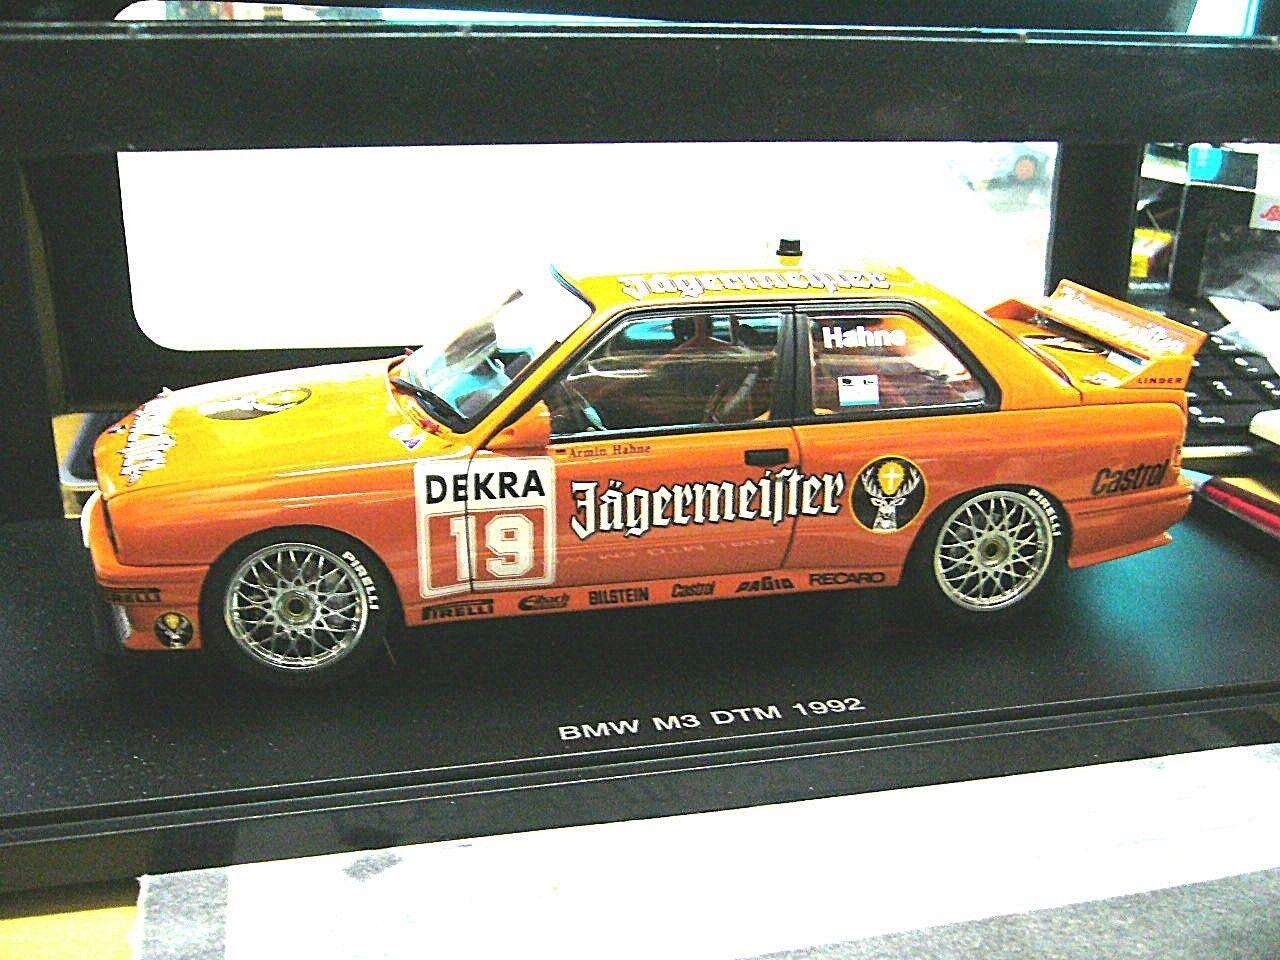 BMW m3 3er e30 DTM 1992 JAGERMEISTER  19 Hahne équipe Linder RAR Autoart 1 18